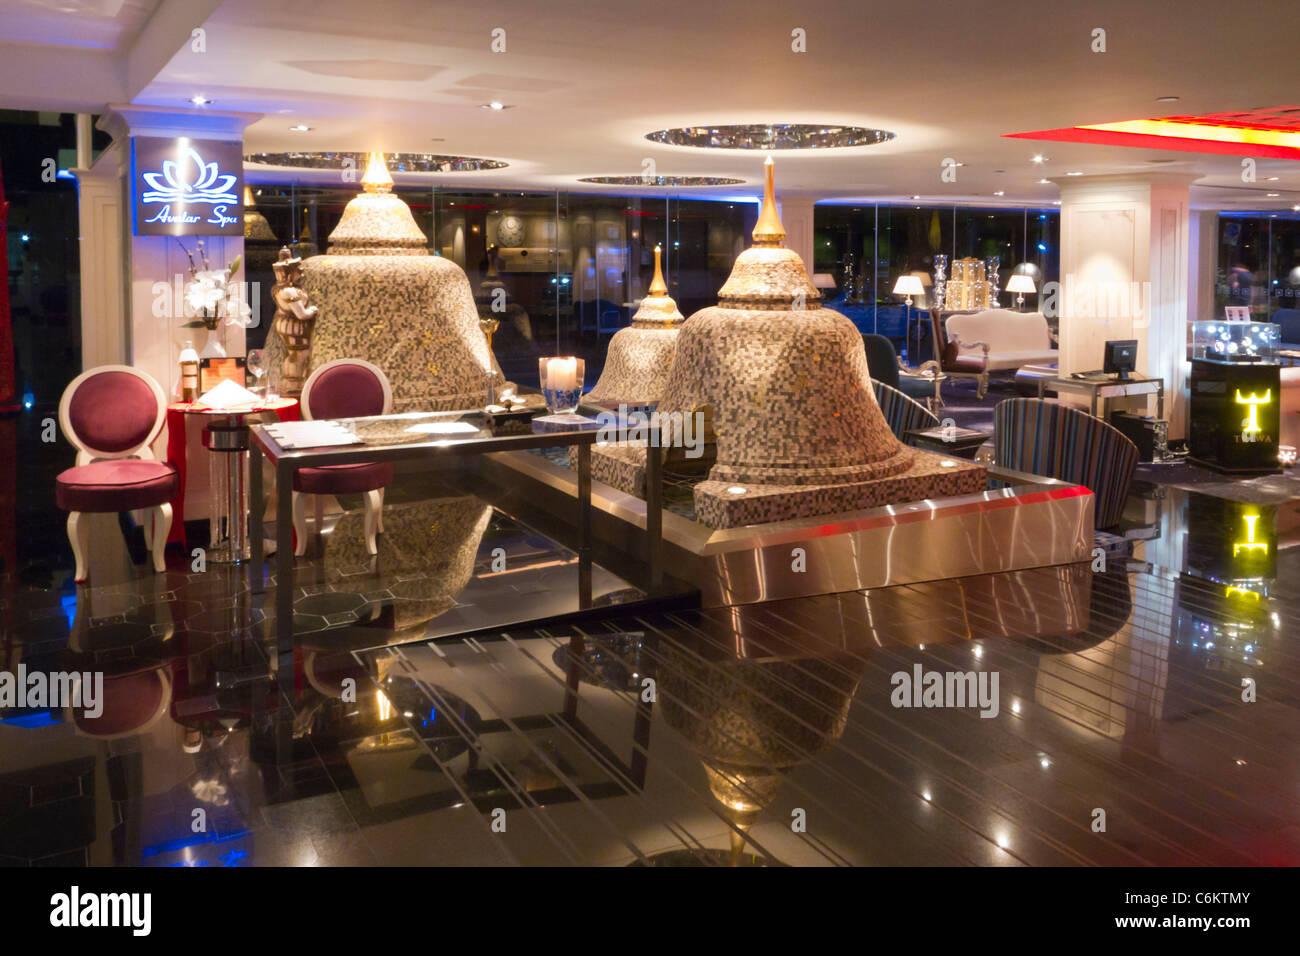 Dream Hotel , Lobby with pagodas, Bangkok, Thailand Stock Photo